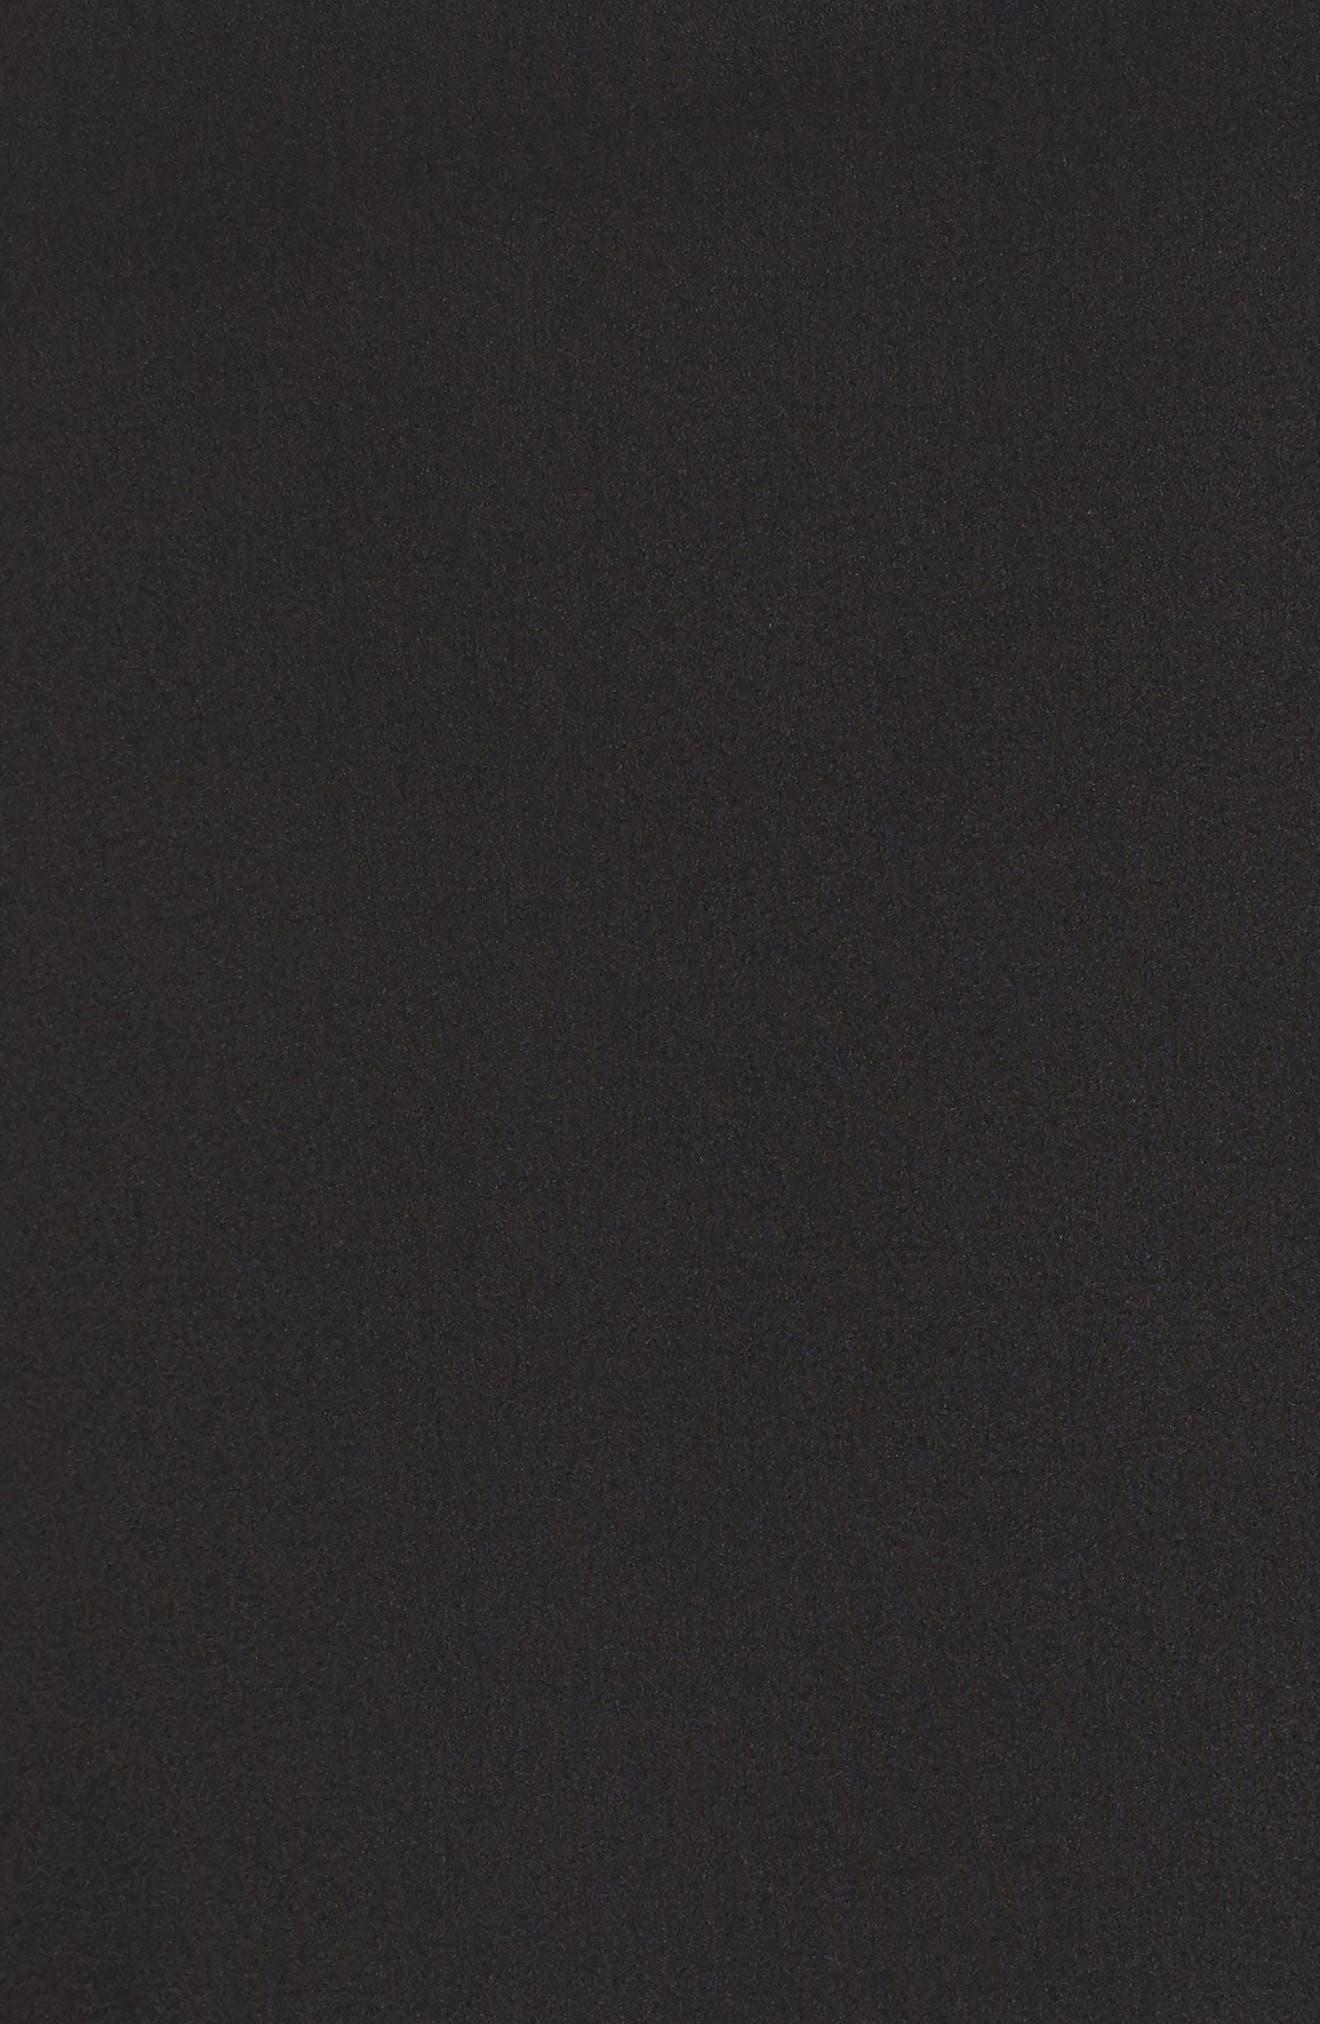 Chiffon Overlay Tee,                             Alternate thumbnail 5, color,                             Black